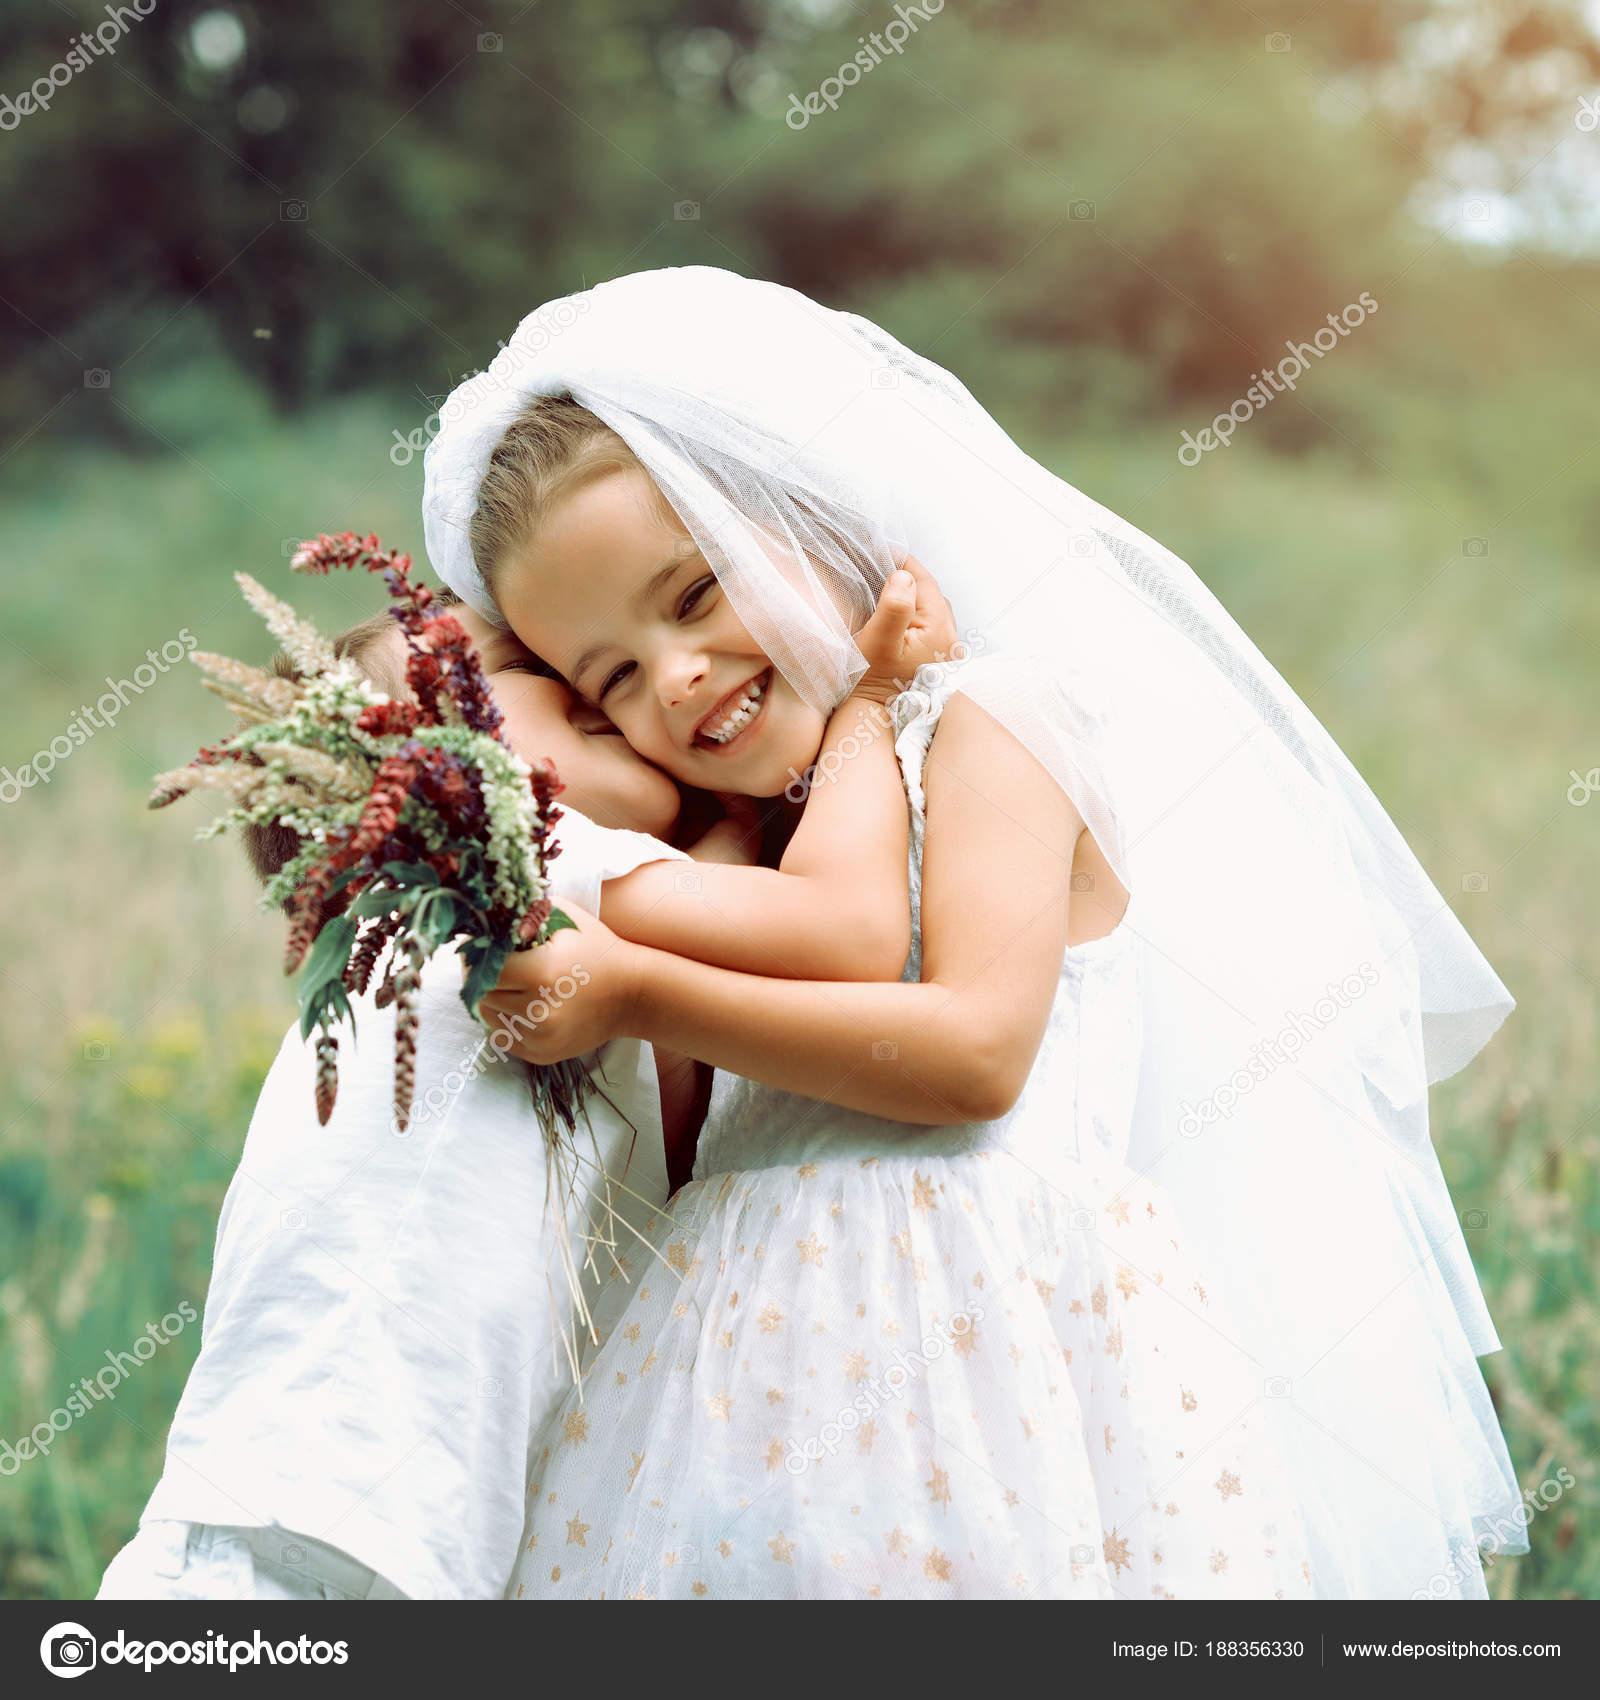 0832e28aa75b Τα παιδιά σαν νεόνυμφοι. Μικρό αγόρι γαμπρός φιλάει τον νεαρό κορίτσι στο φόρεμα  νύφη άσπρη και νυφικό πέπλο